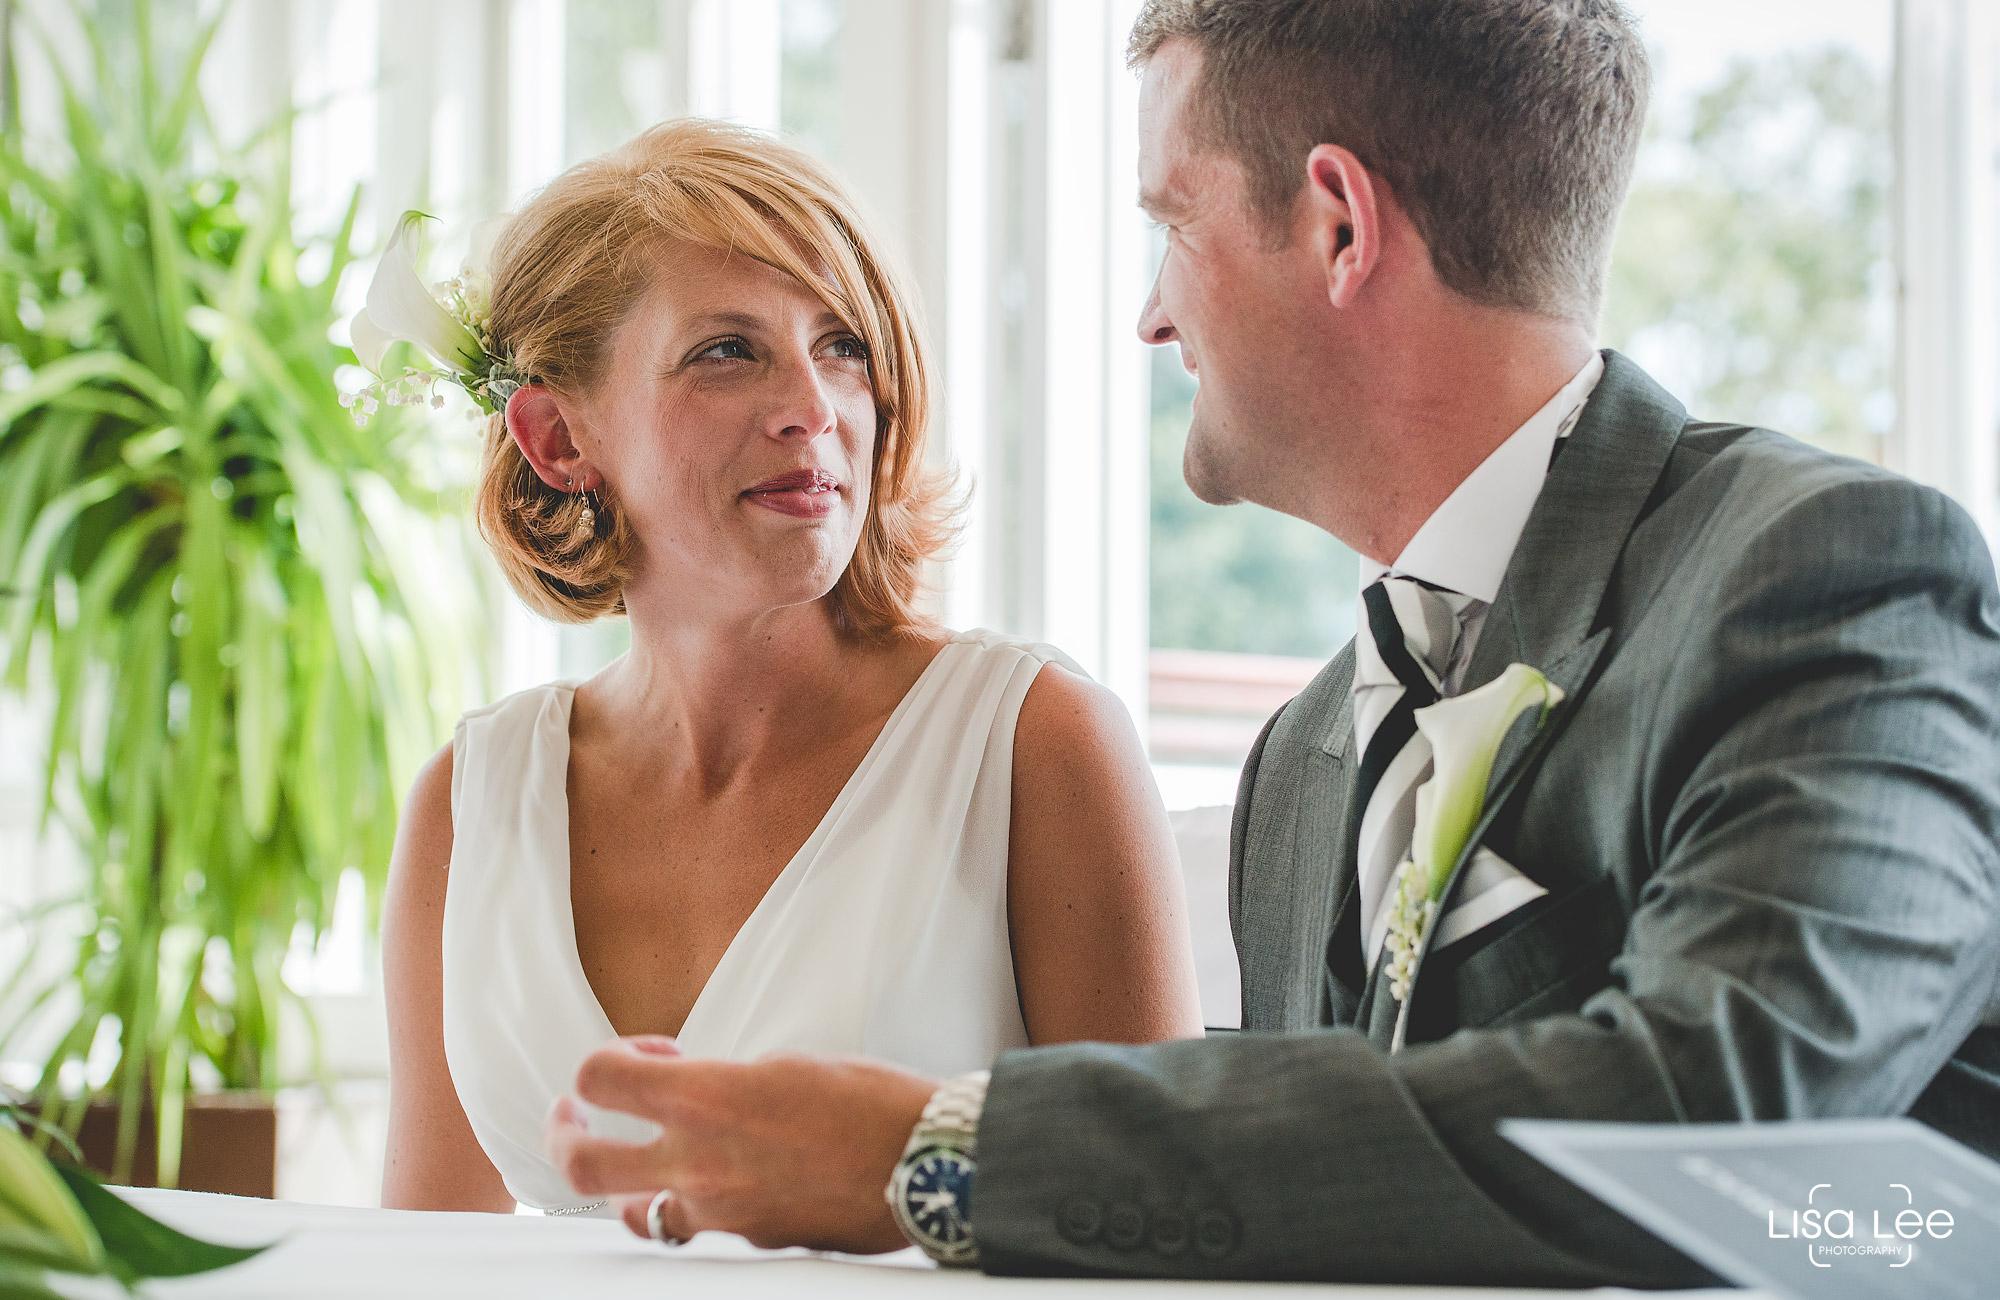 lisa-lee-wedding-photography-christchurch-dorset-bridegroom1.jpg